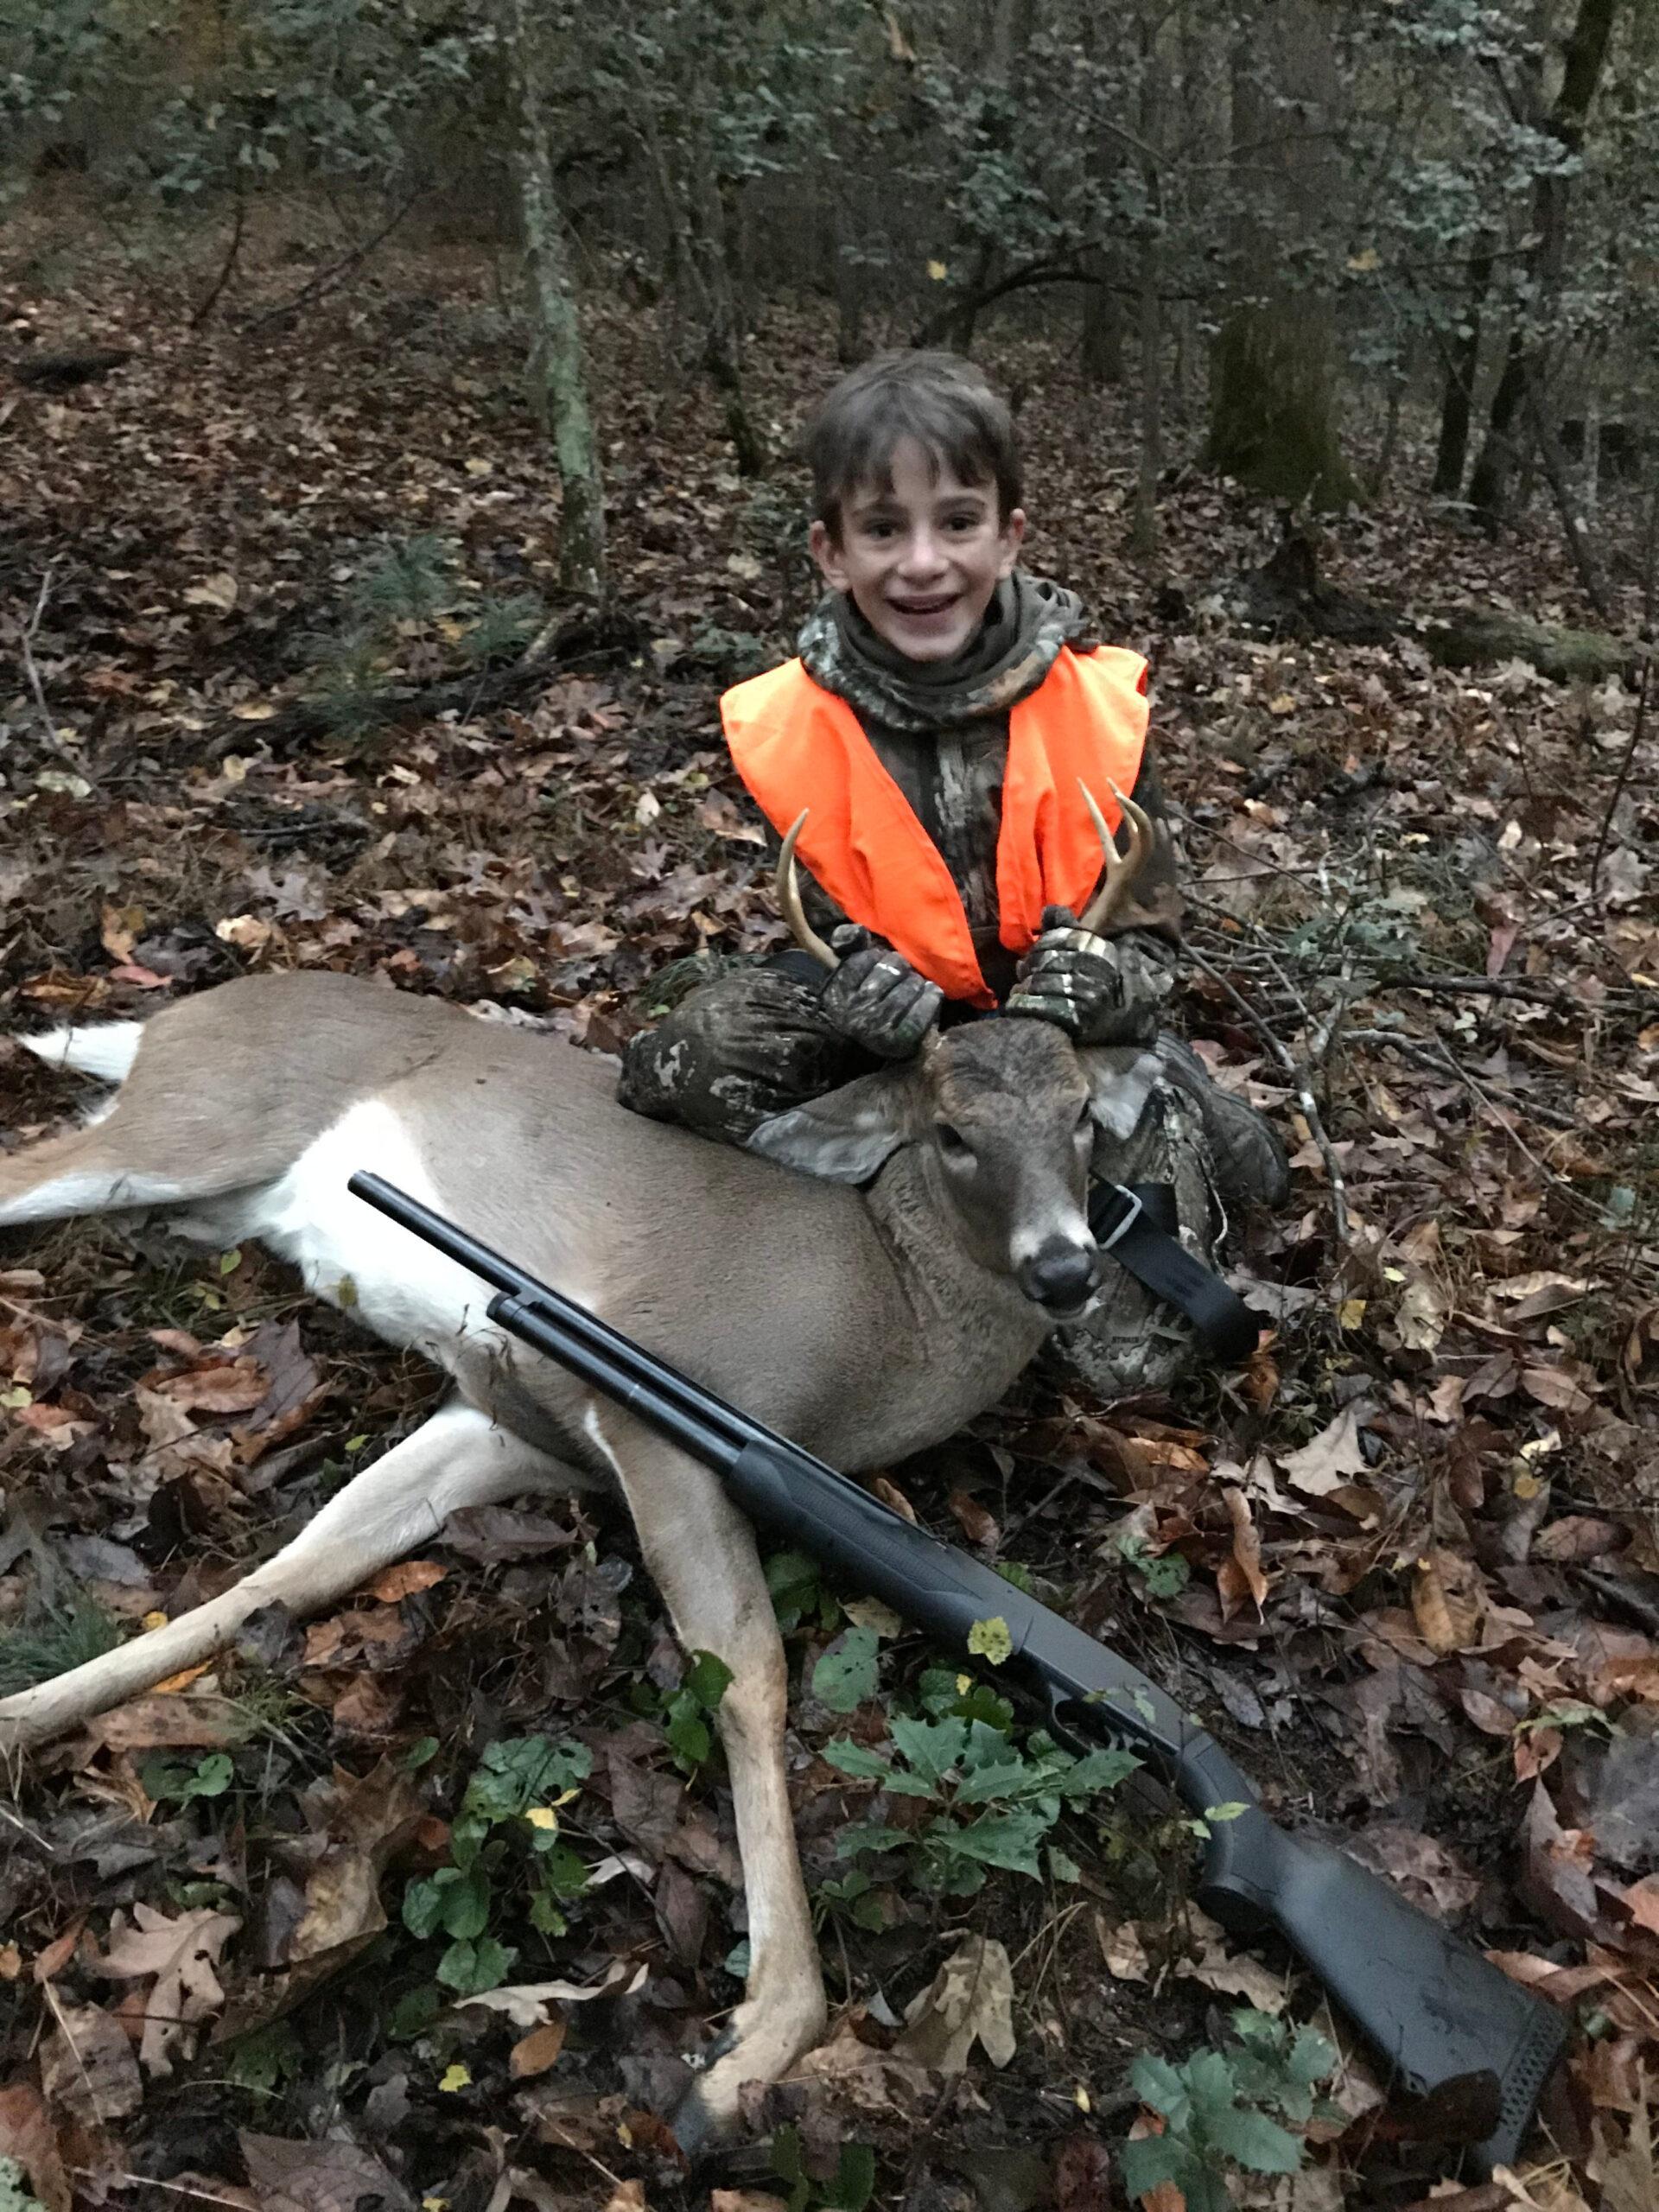 Hunting Season Ready To Fill The Fall Calendar